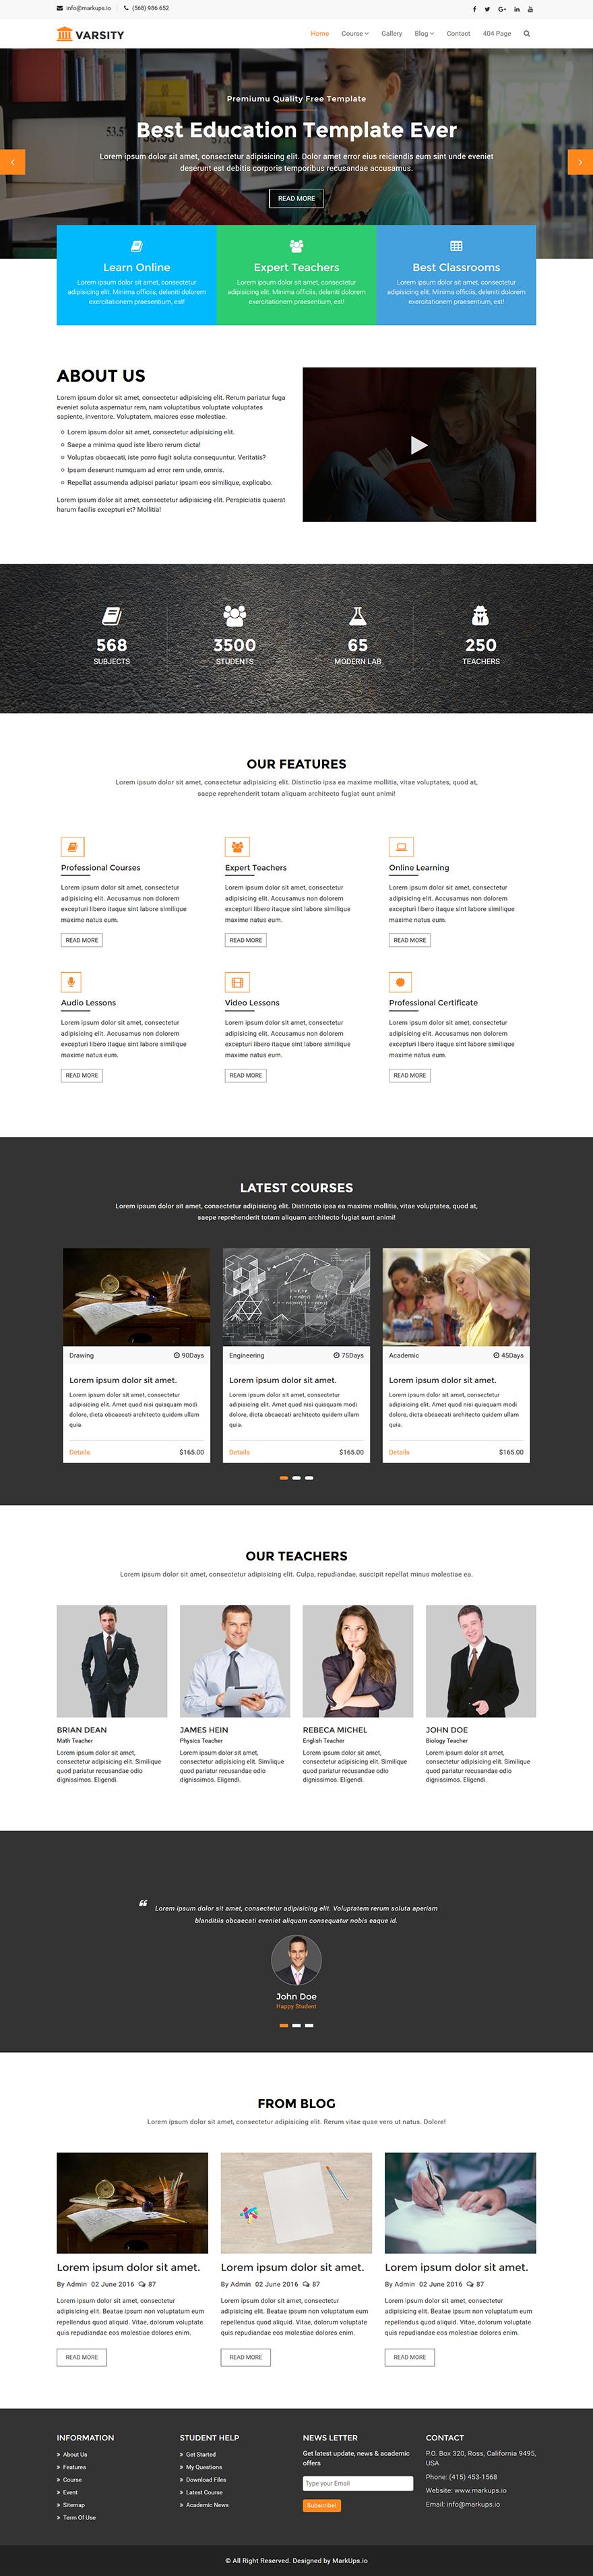 Free Education Website HTML Template - Varsity | HTML Template Free ...